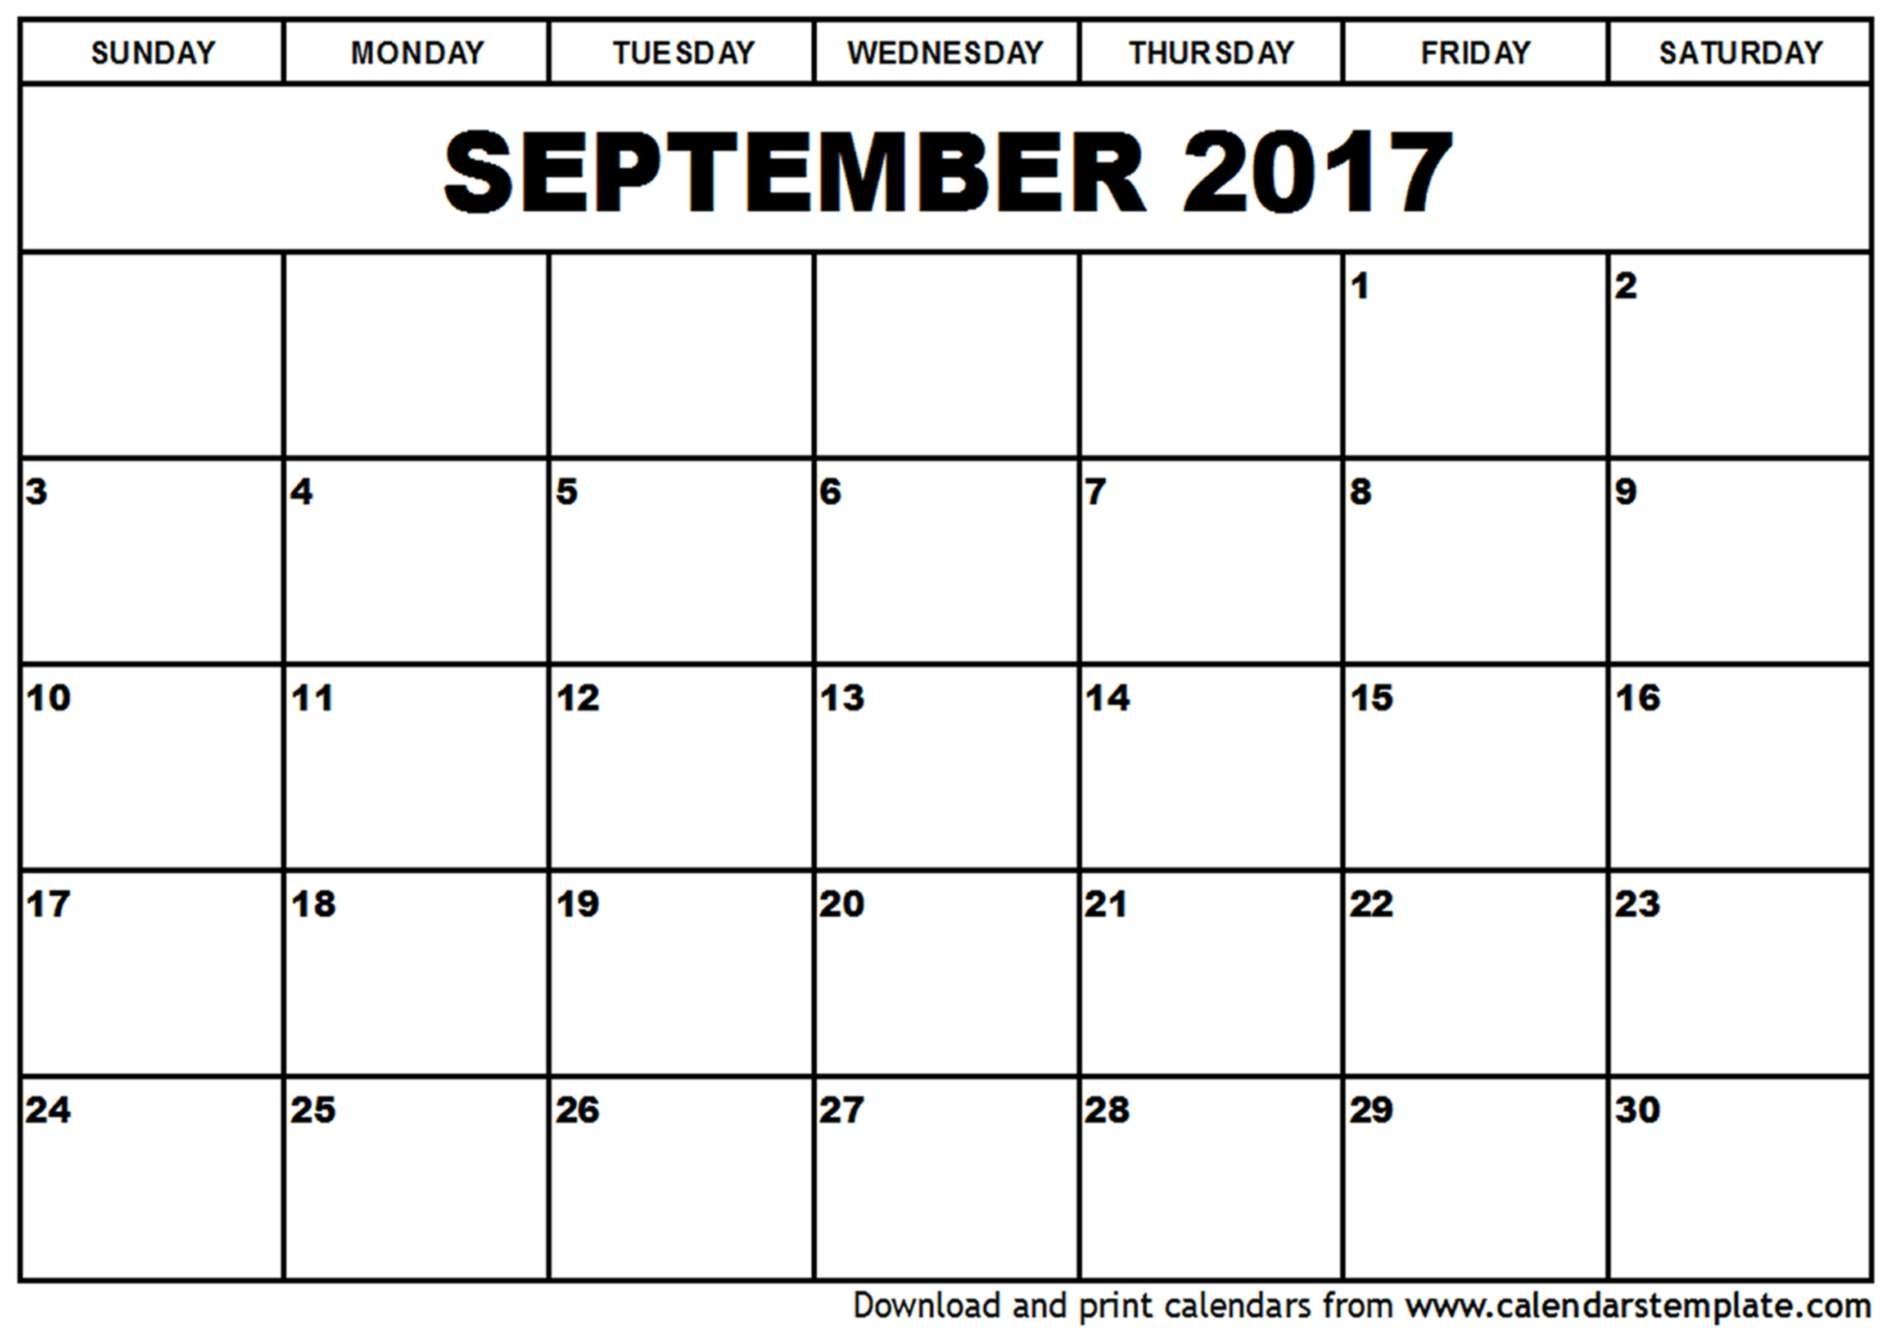 017 Calendar Monthly Template Imposing 2017 Ideas September October throughout Calendar For The Month Of September